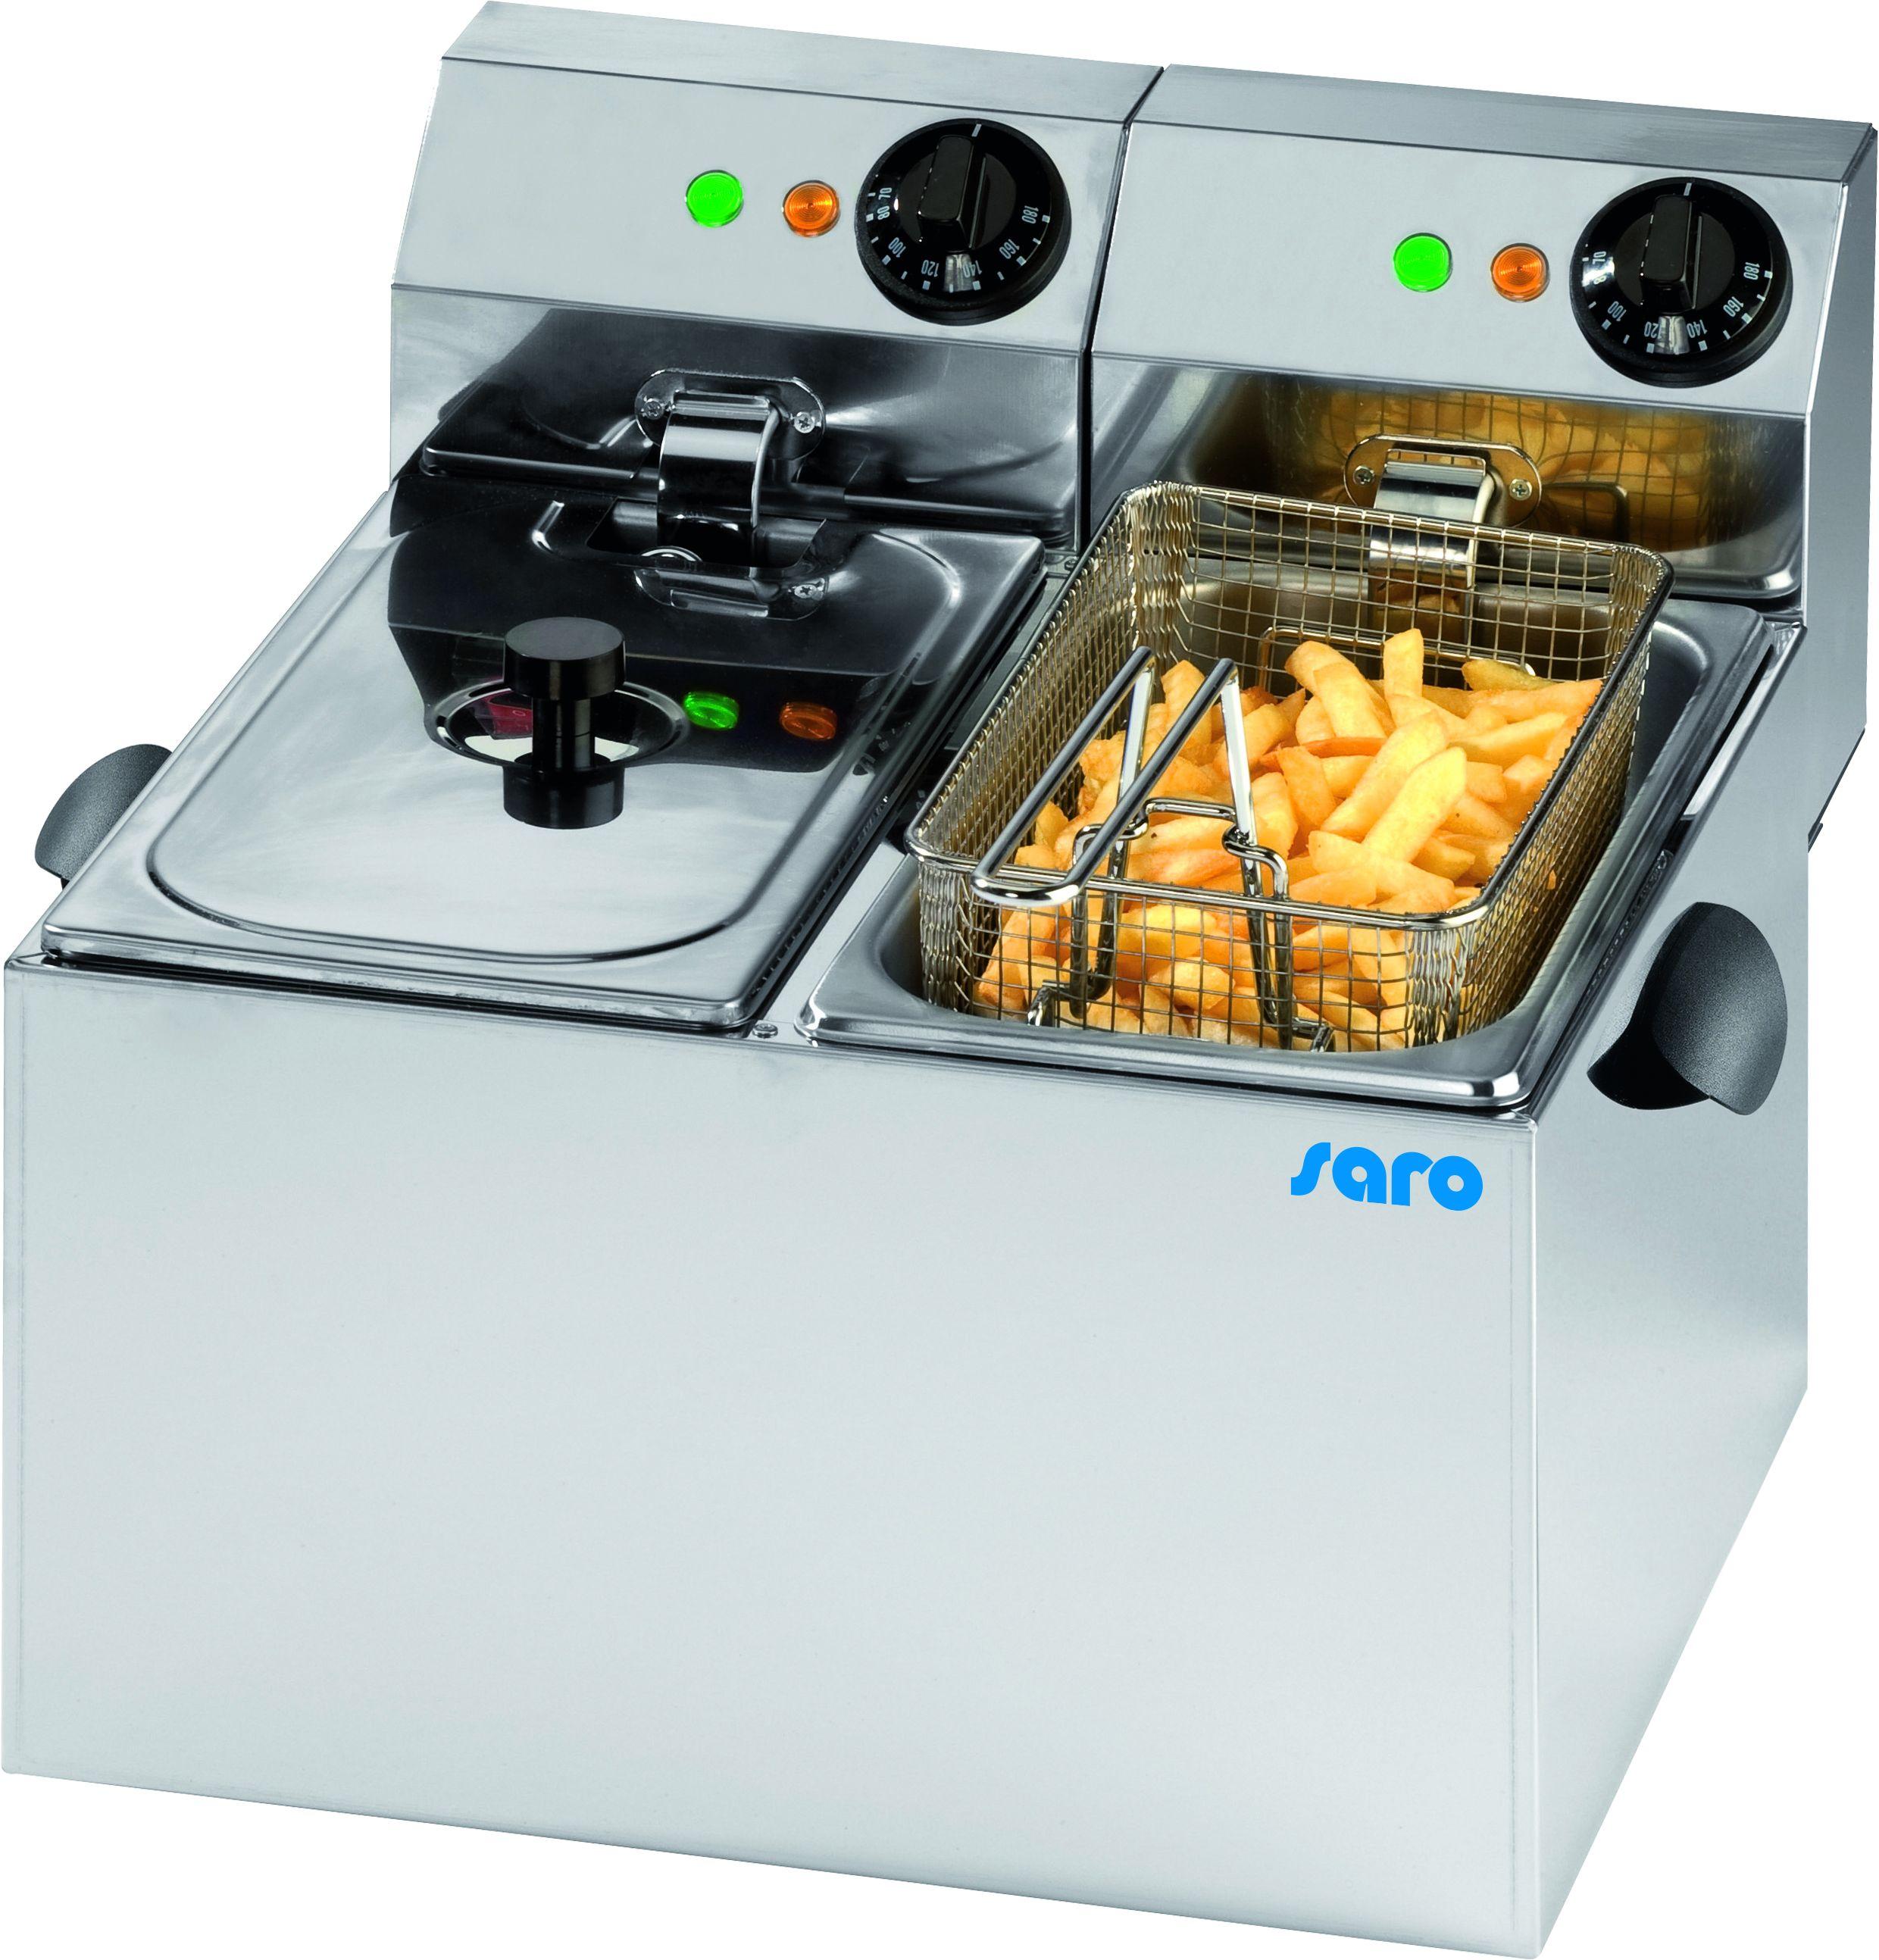 fritteuse modell profri 66 | saro - Dampfgarer Großküche